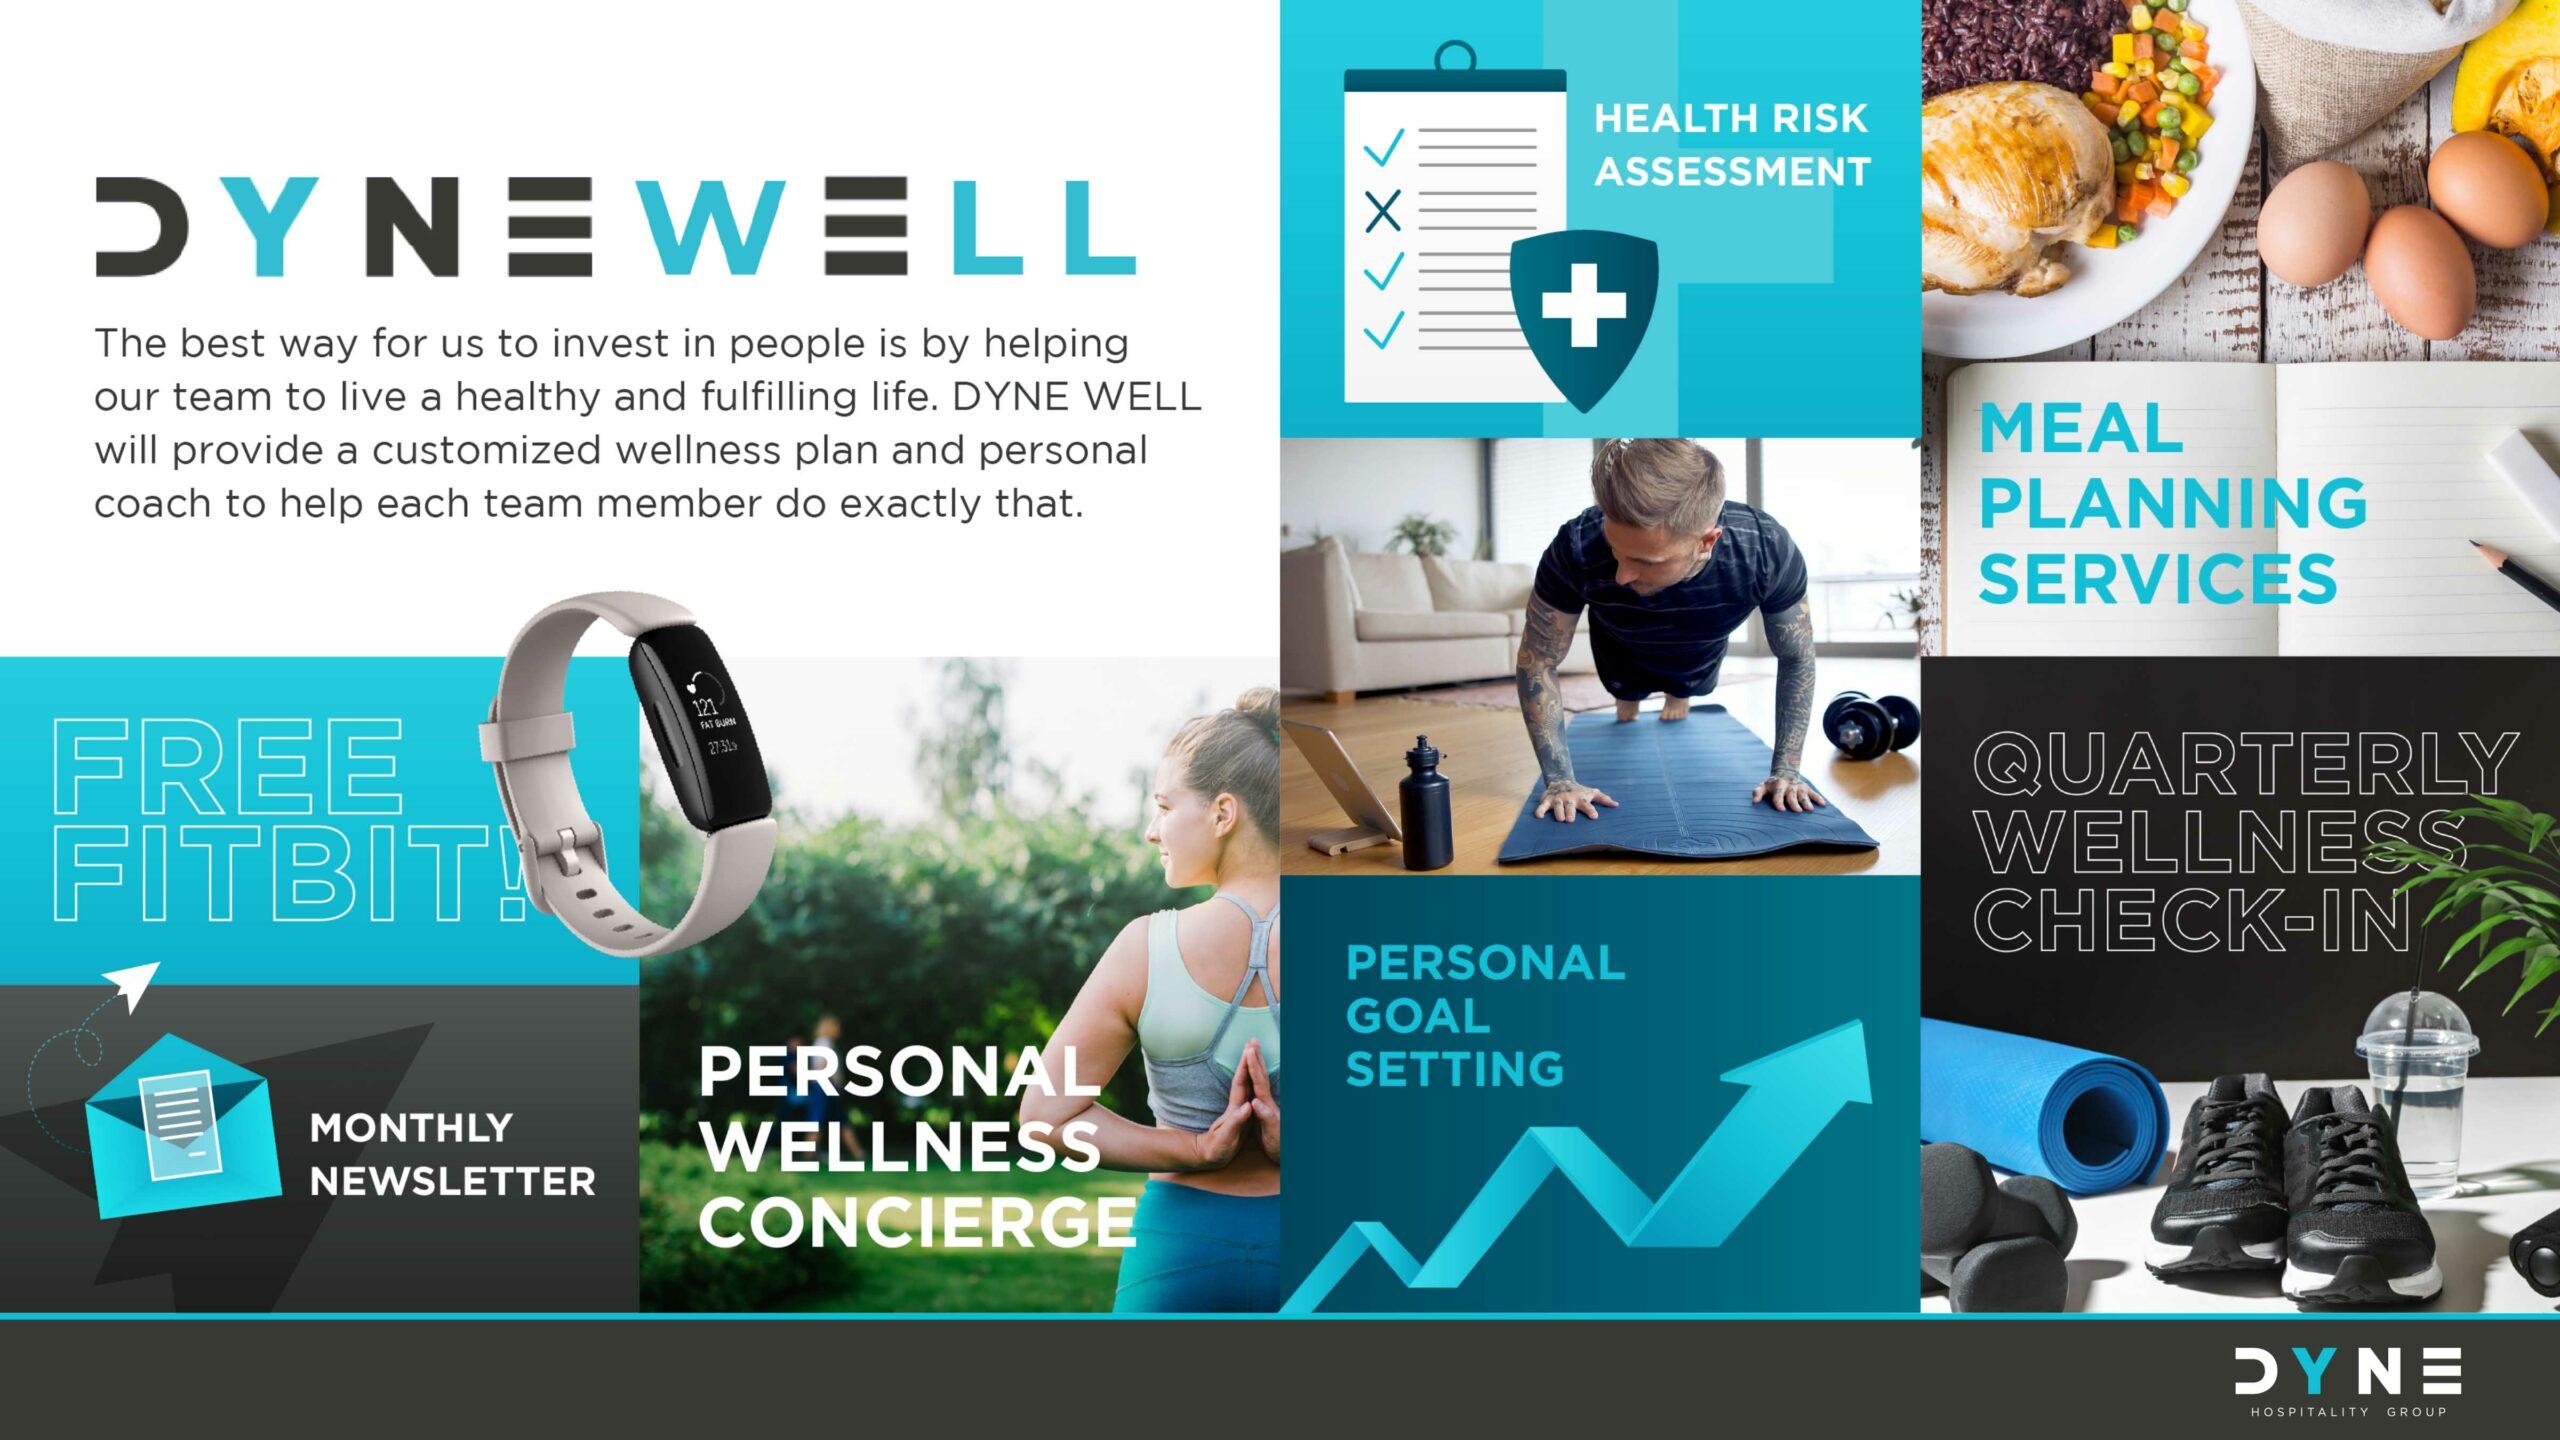 DYNEWELL, an Employee Wellness Program